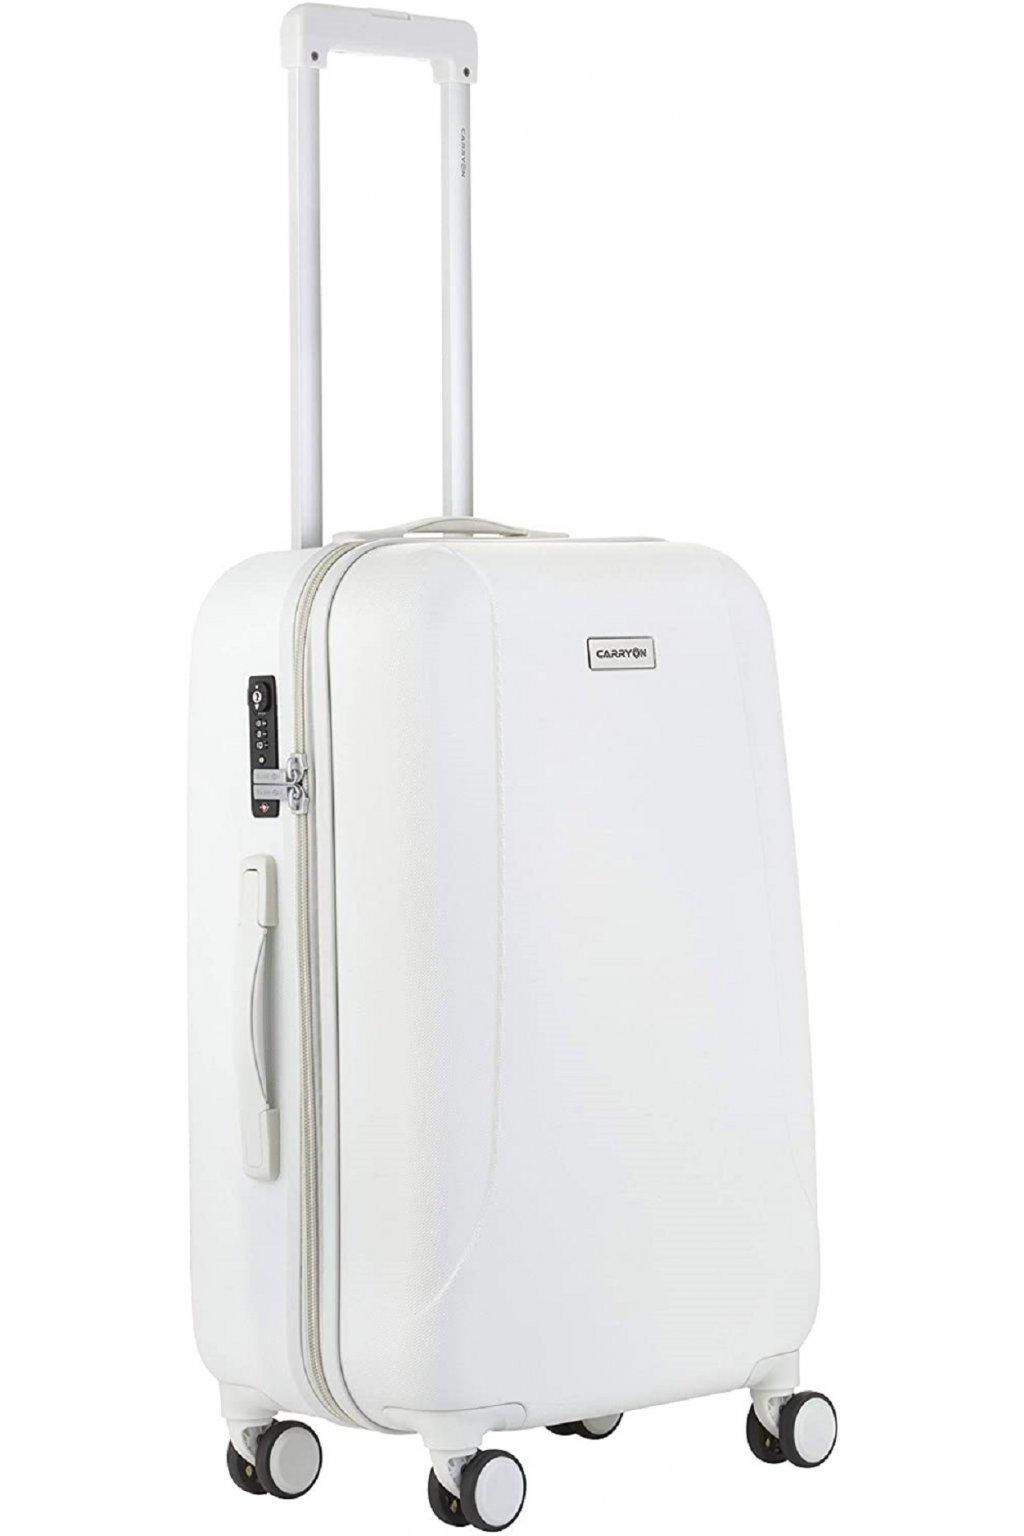 kufrland carryon skyhopper white (5)